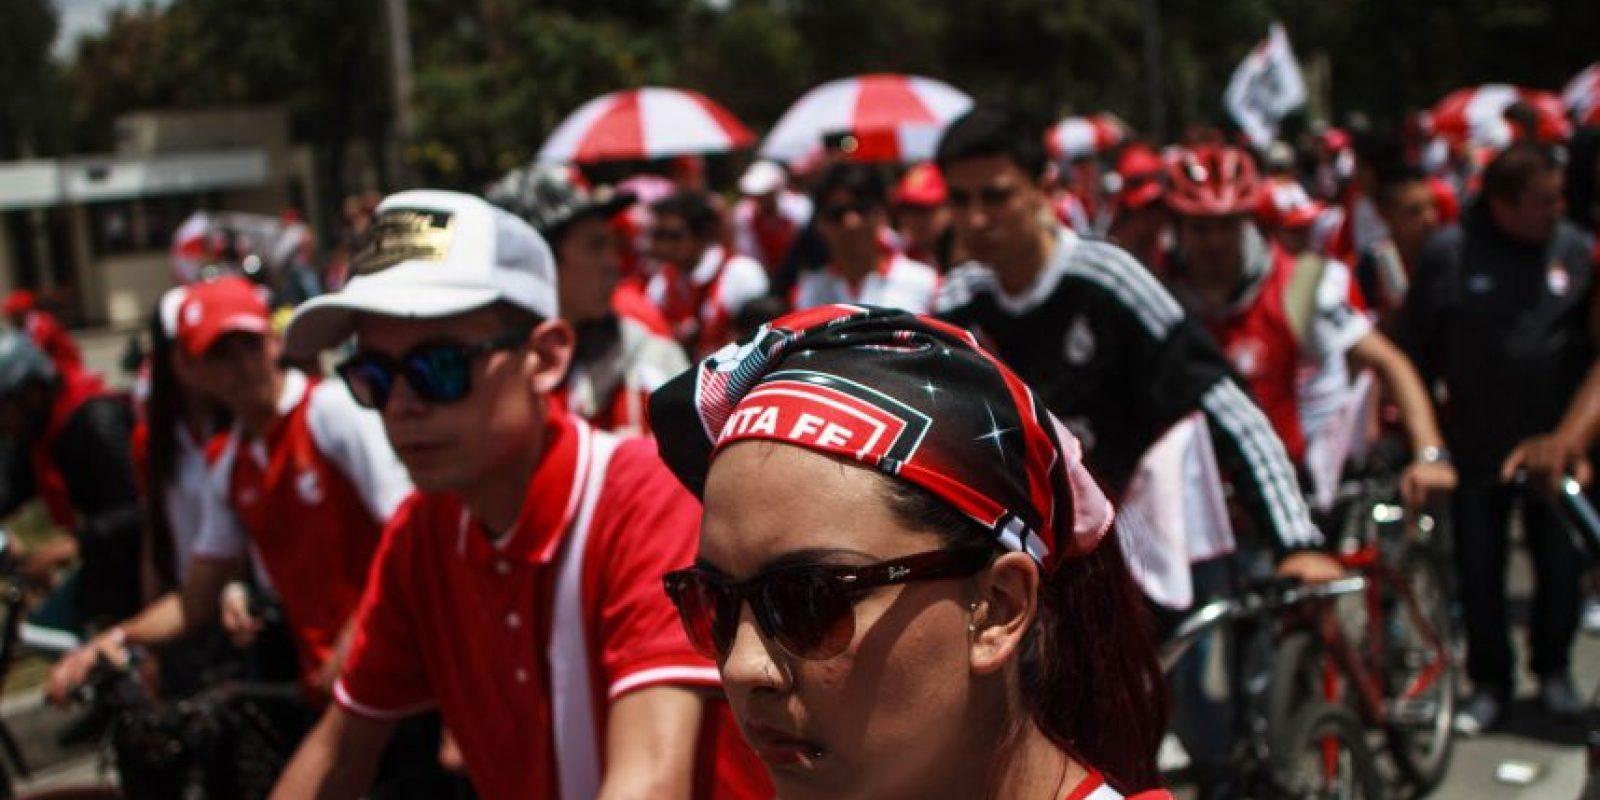 Foto:Juan Pablo Pino – Publimetro